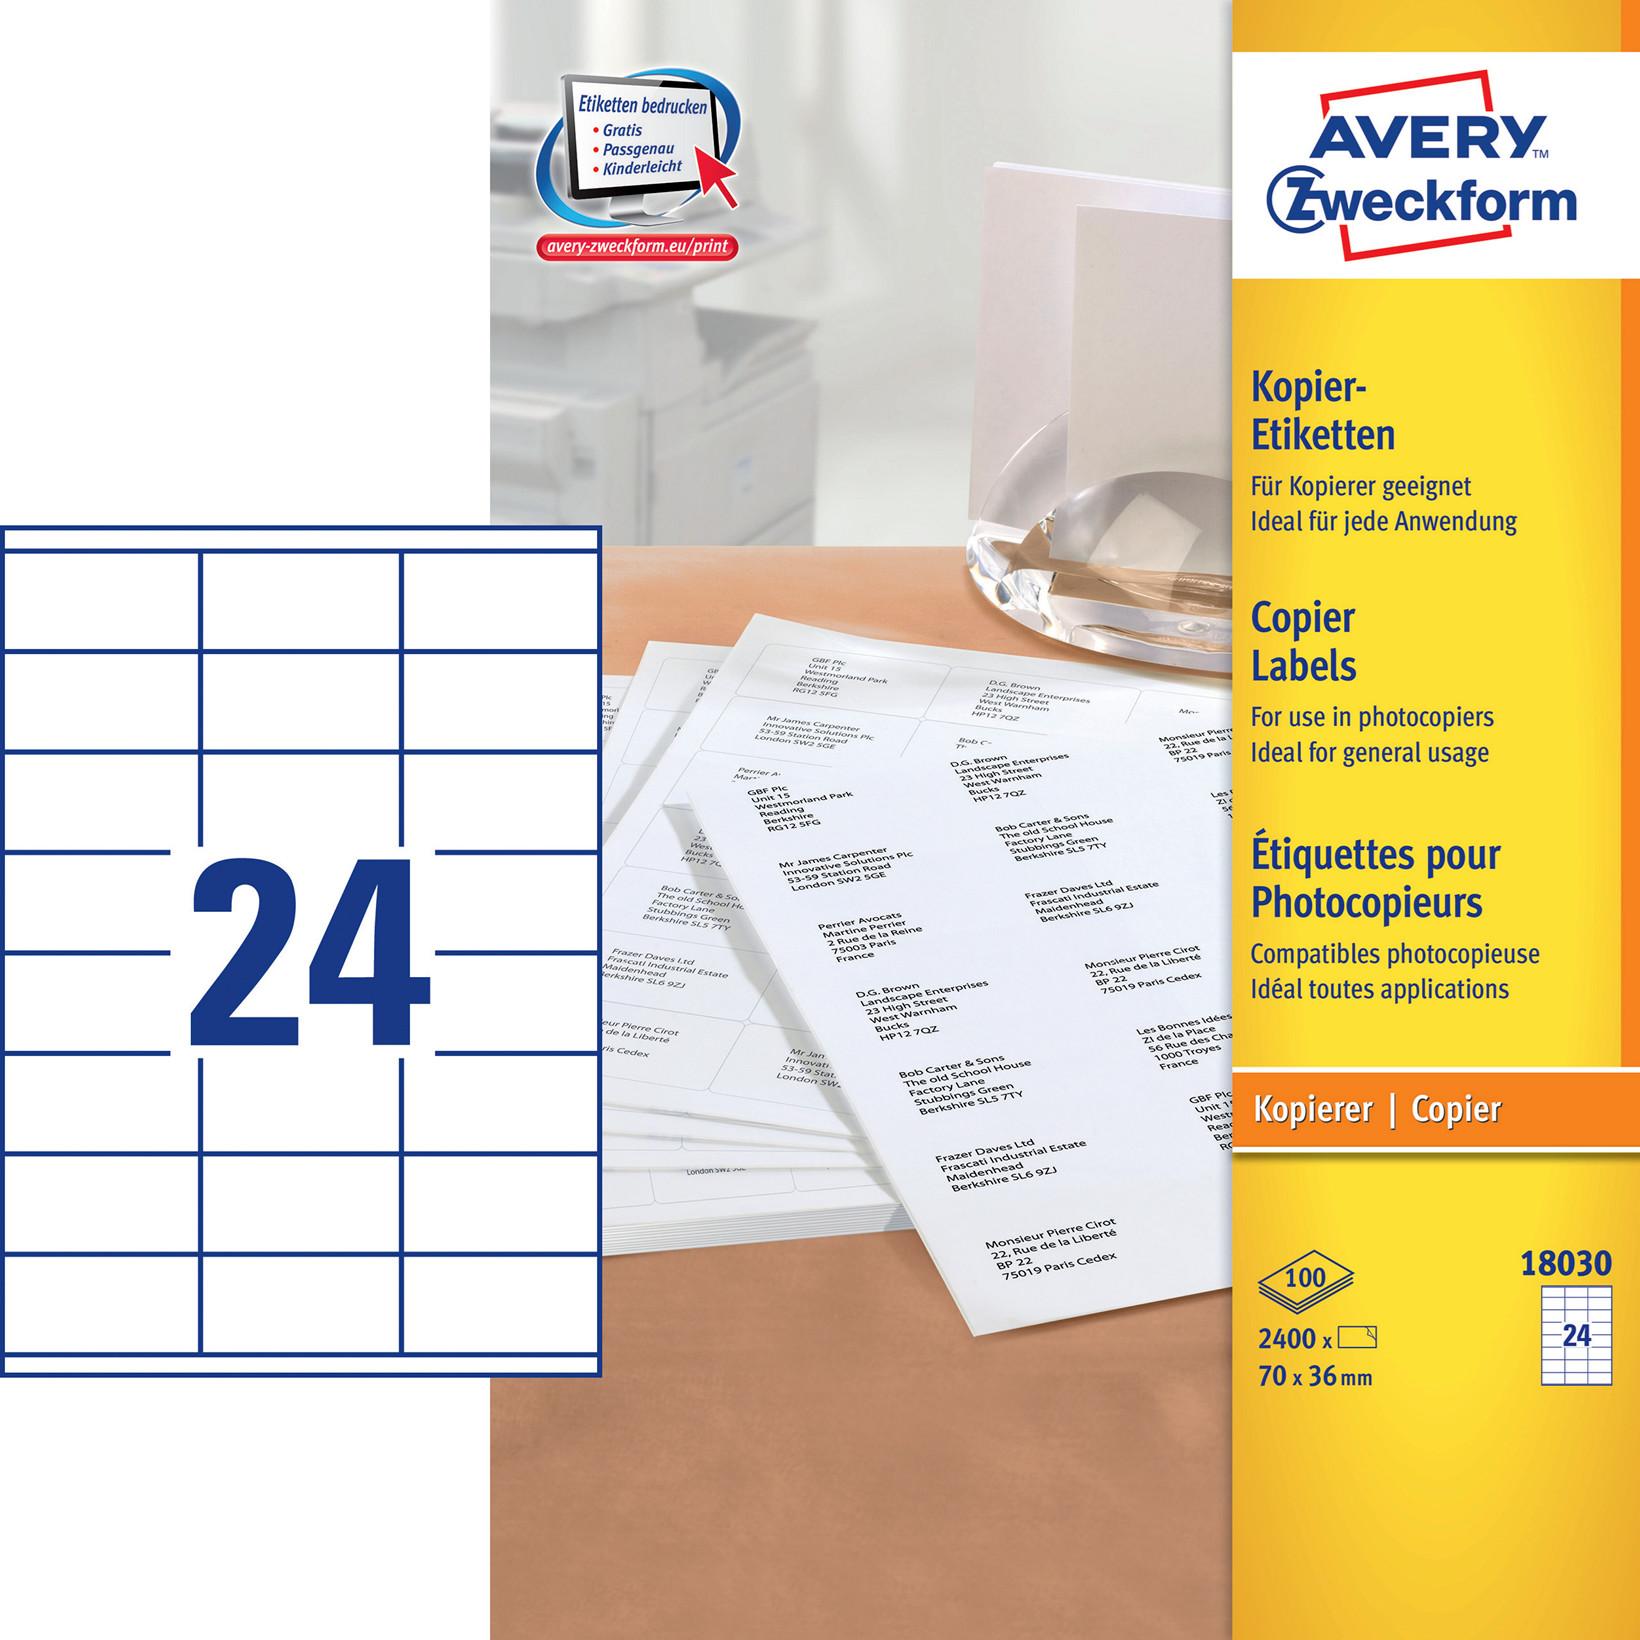 Avery 18030 - Kopietiket 24 pr. ark 36 x 70 mm - 100 ark